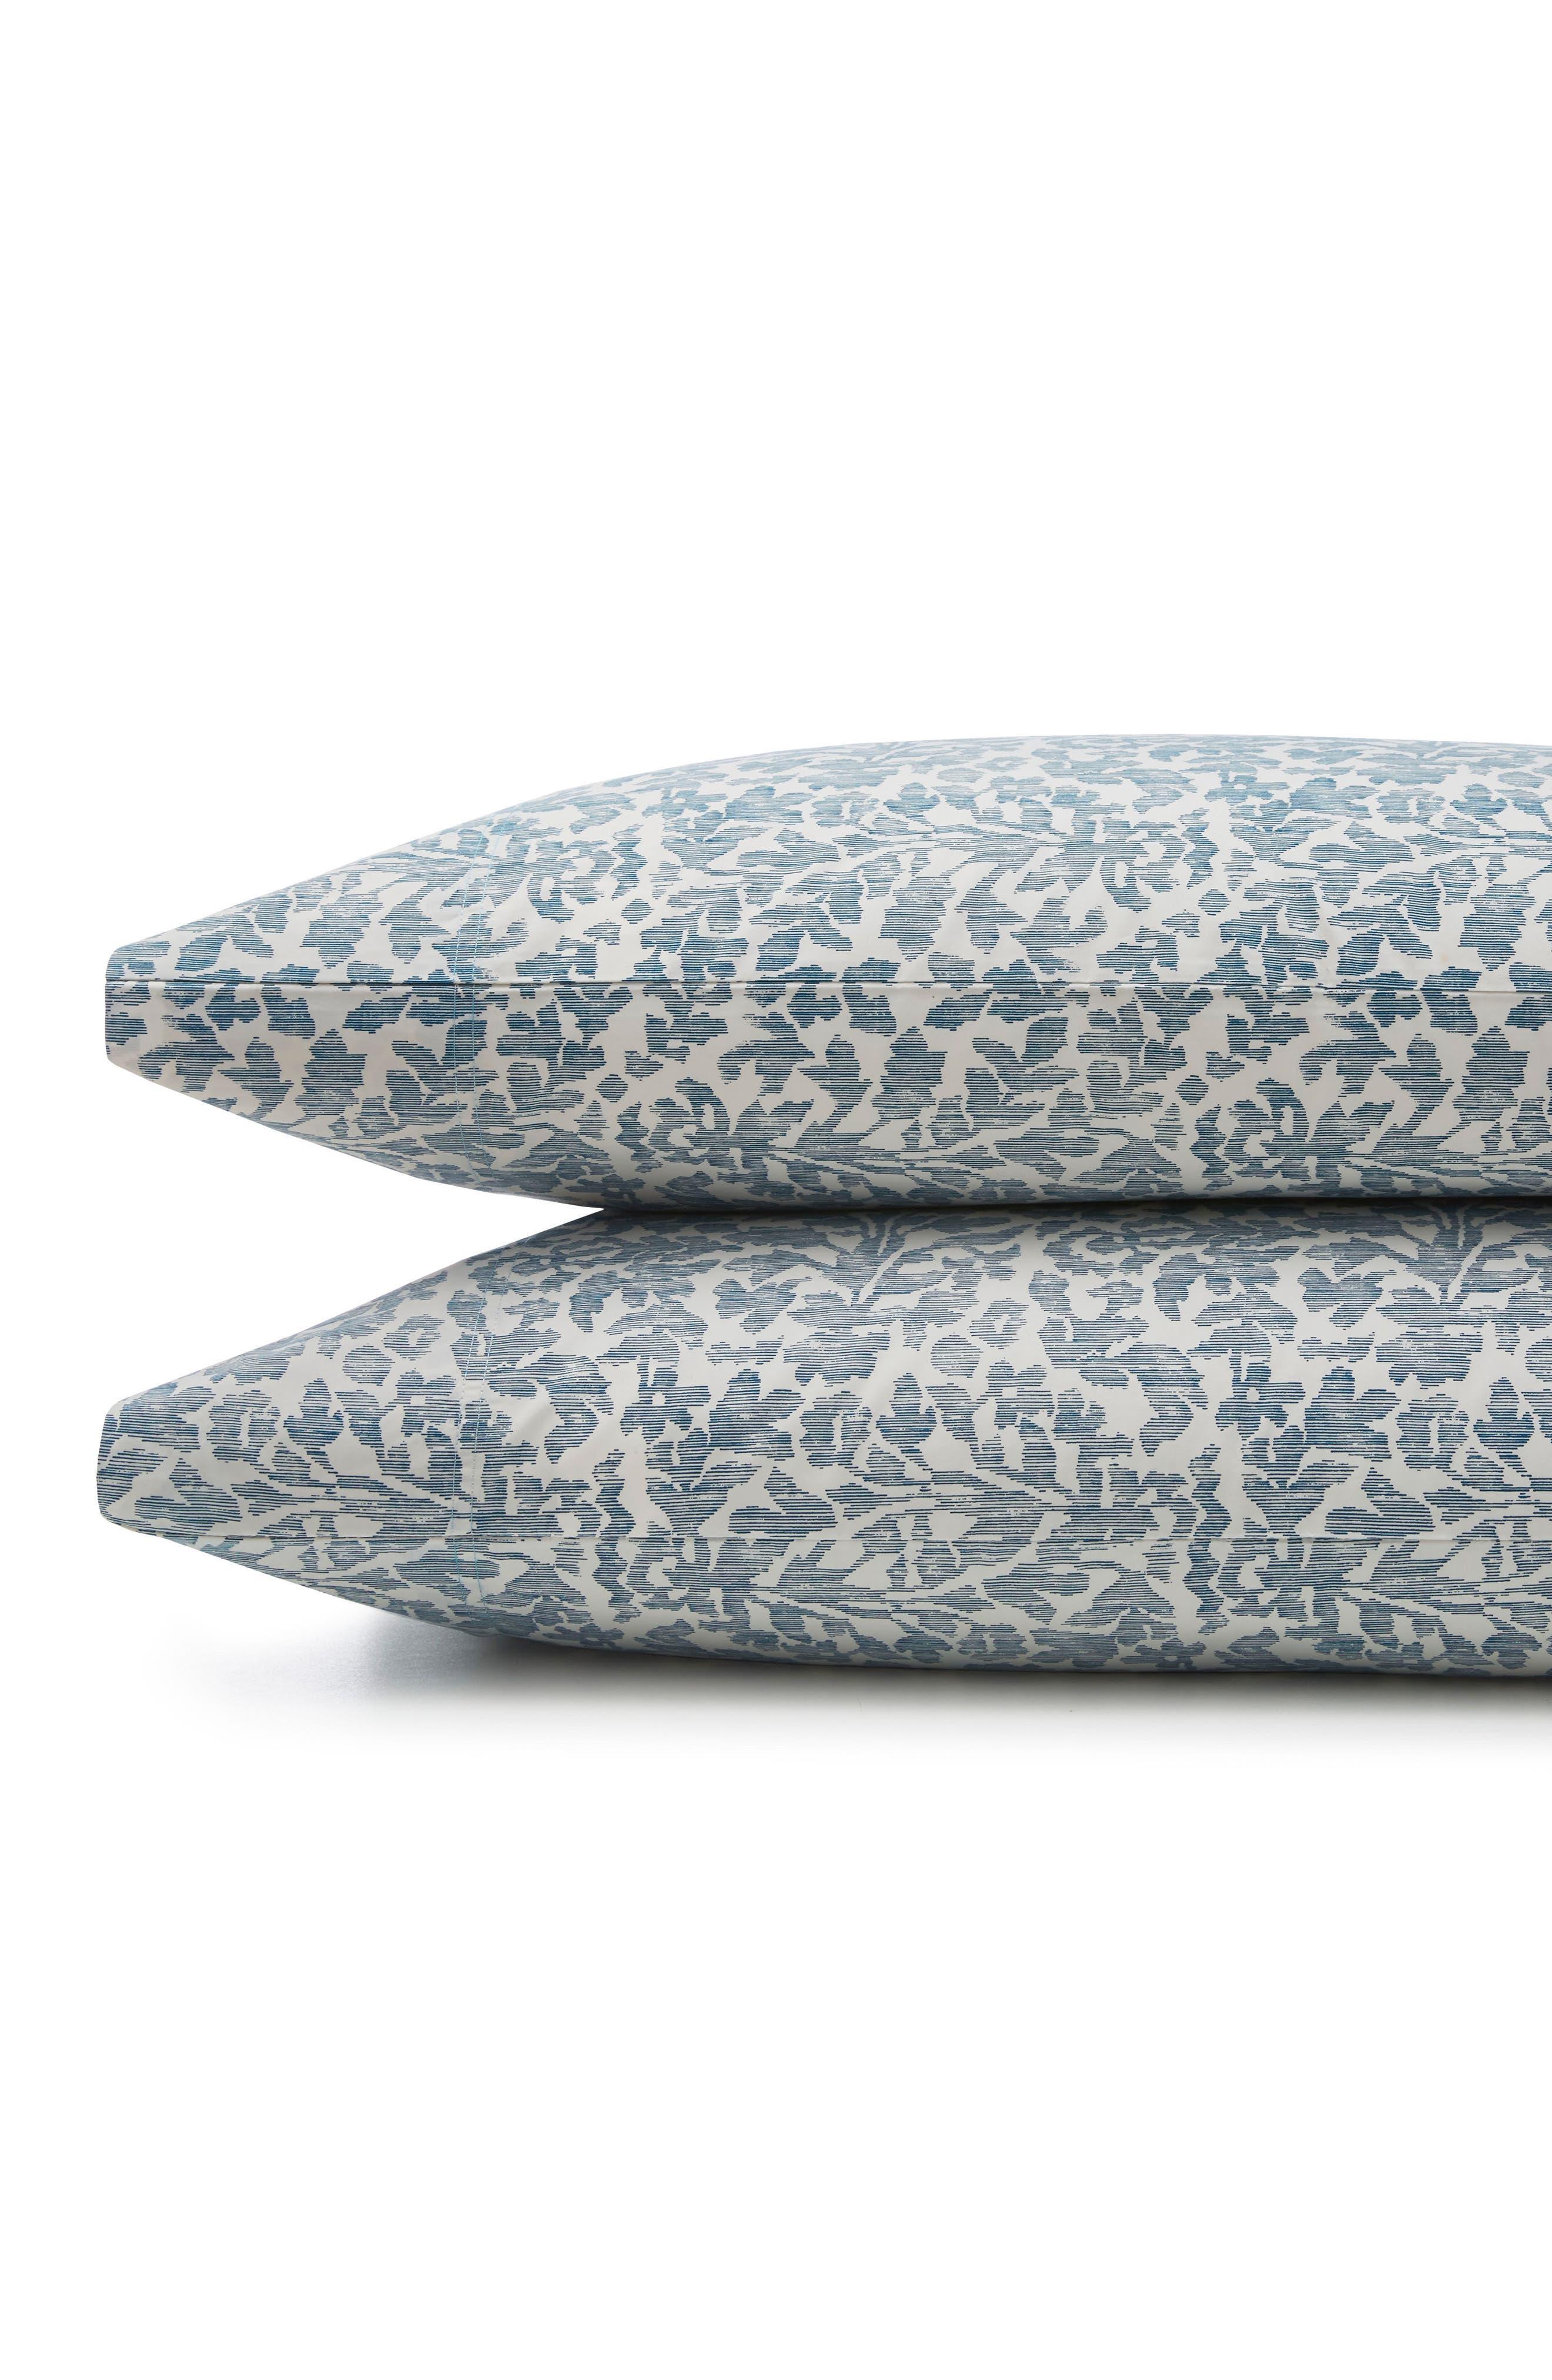 Oaxaca 300 Thread Count Pair of Pillowcases,                             Main thumbnail 1, color,                             Azure/ Turquoise/ Aqua